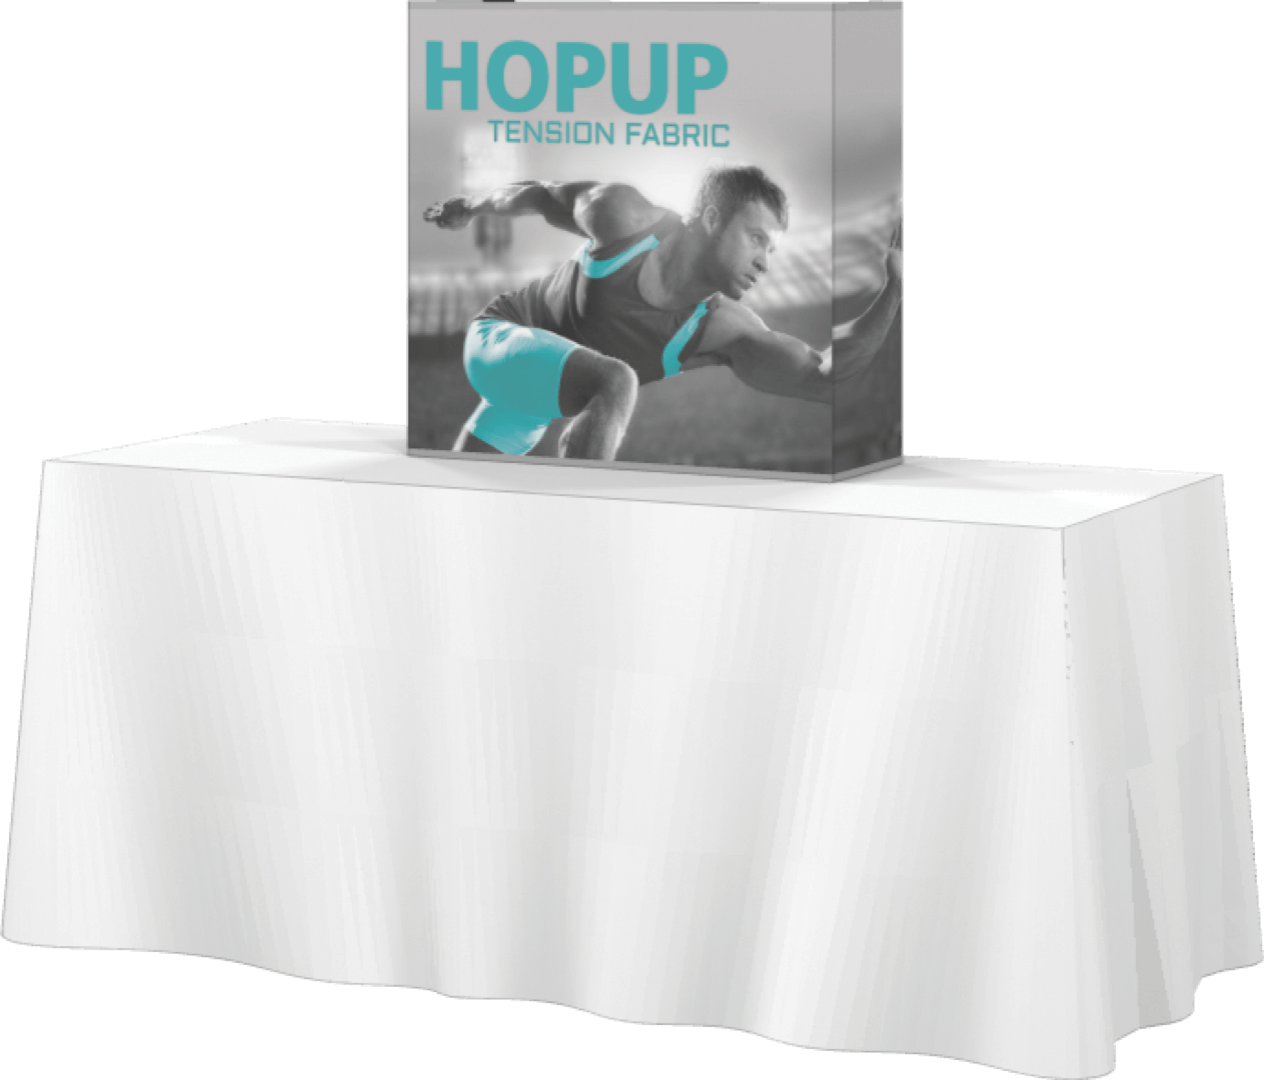 Hop Up Tension Table Top Display